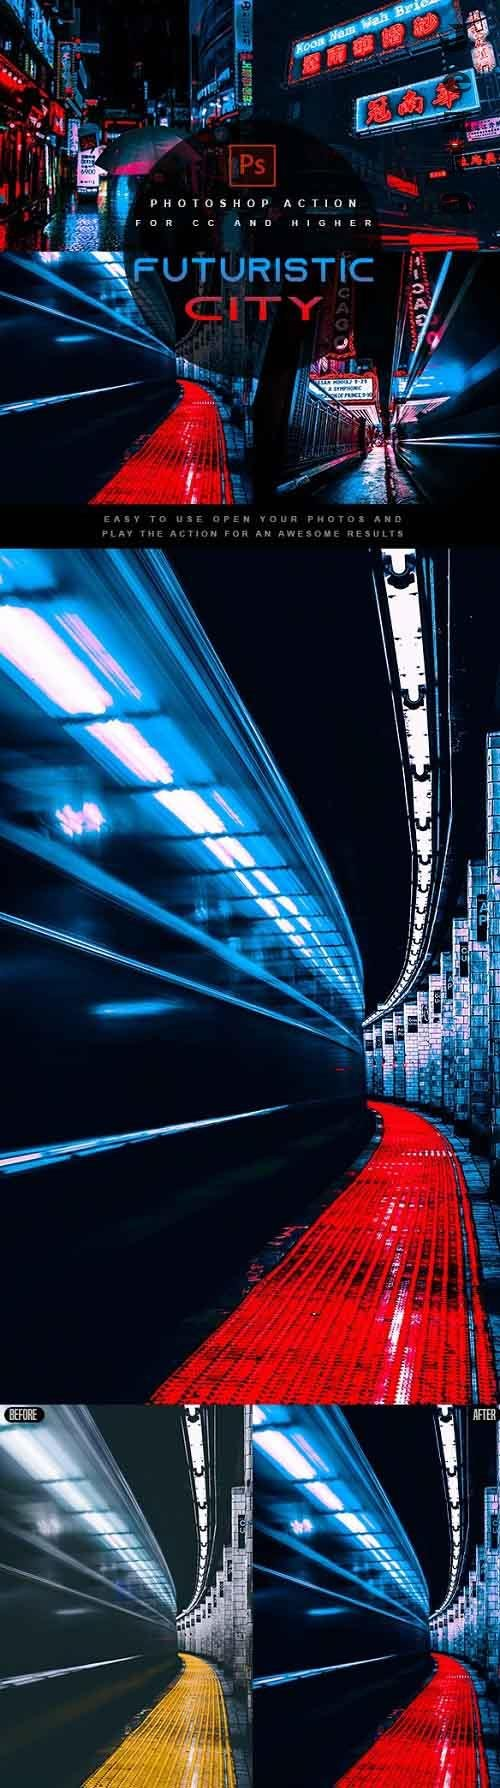 Futuristic City - Photoshop Action 27391328